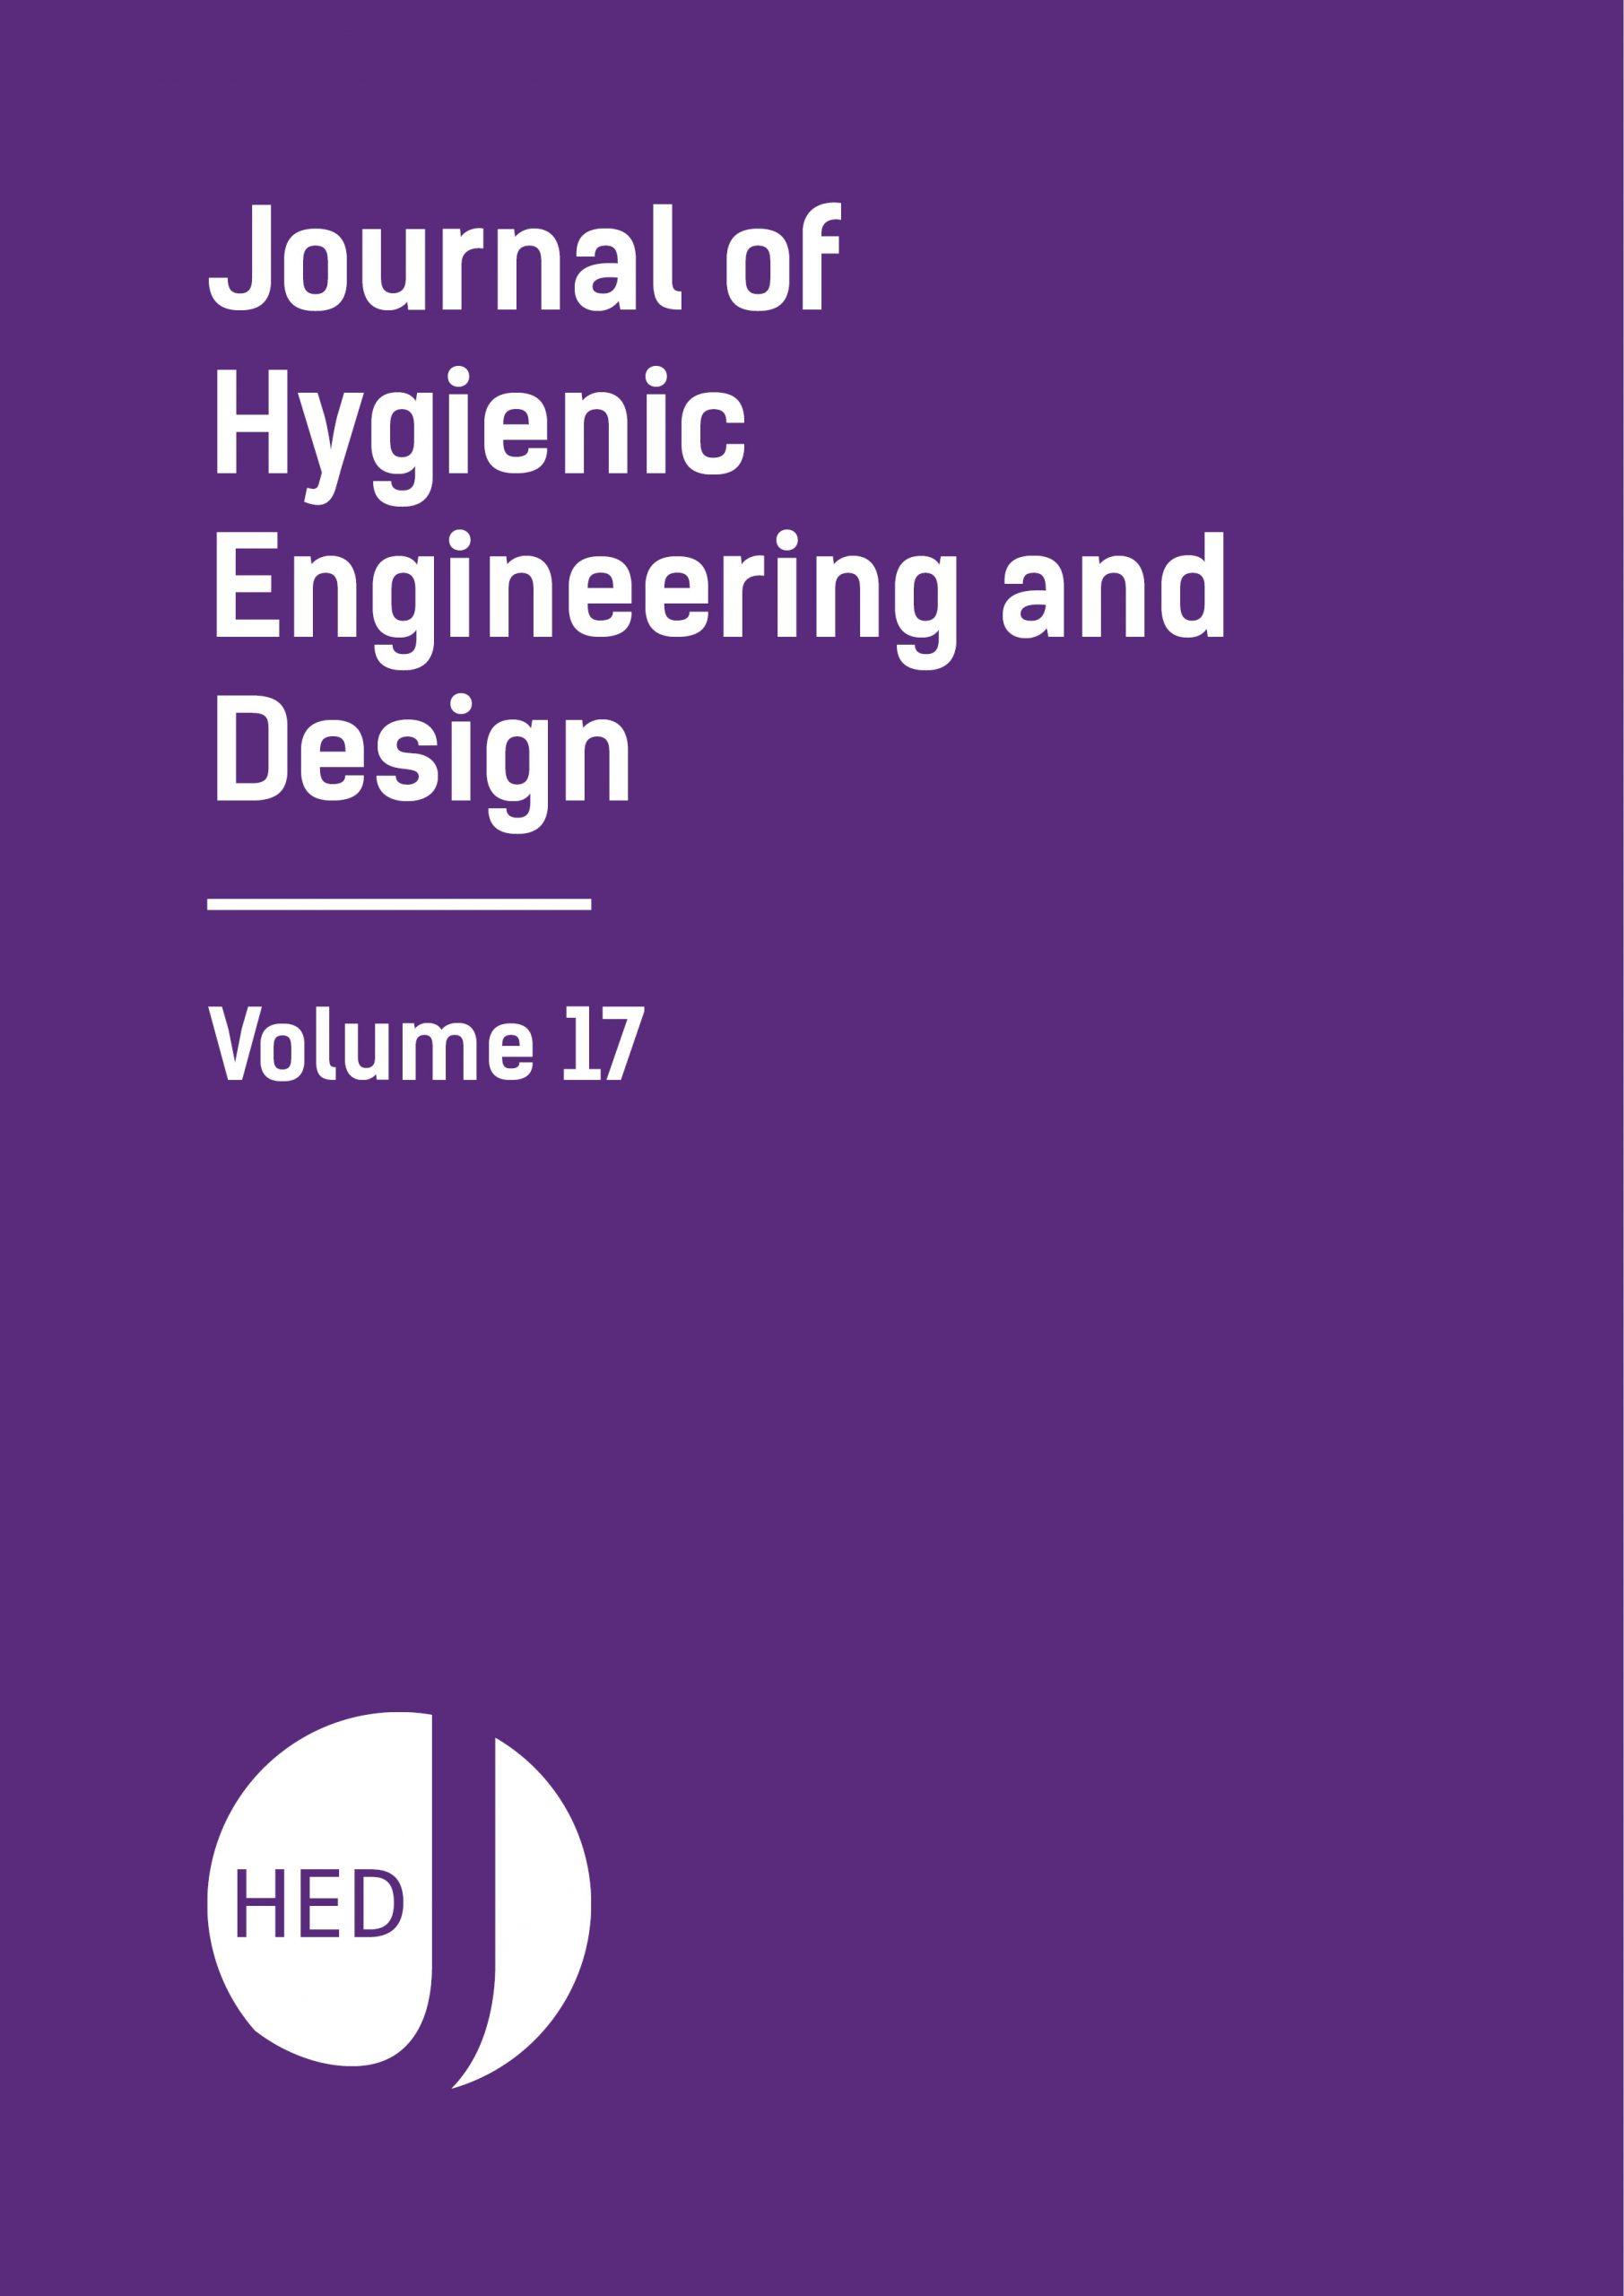 JHED Volume 17